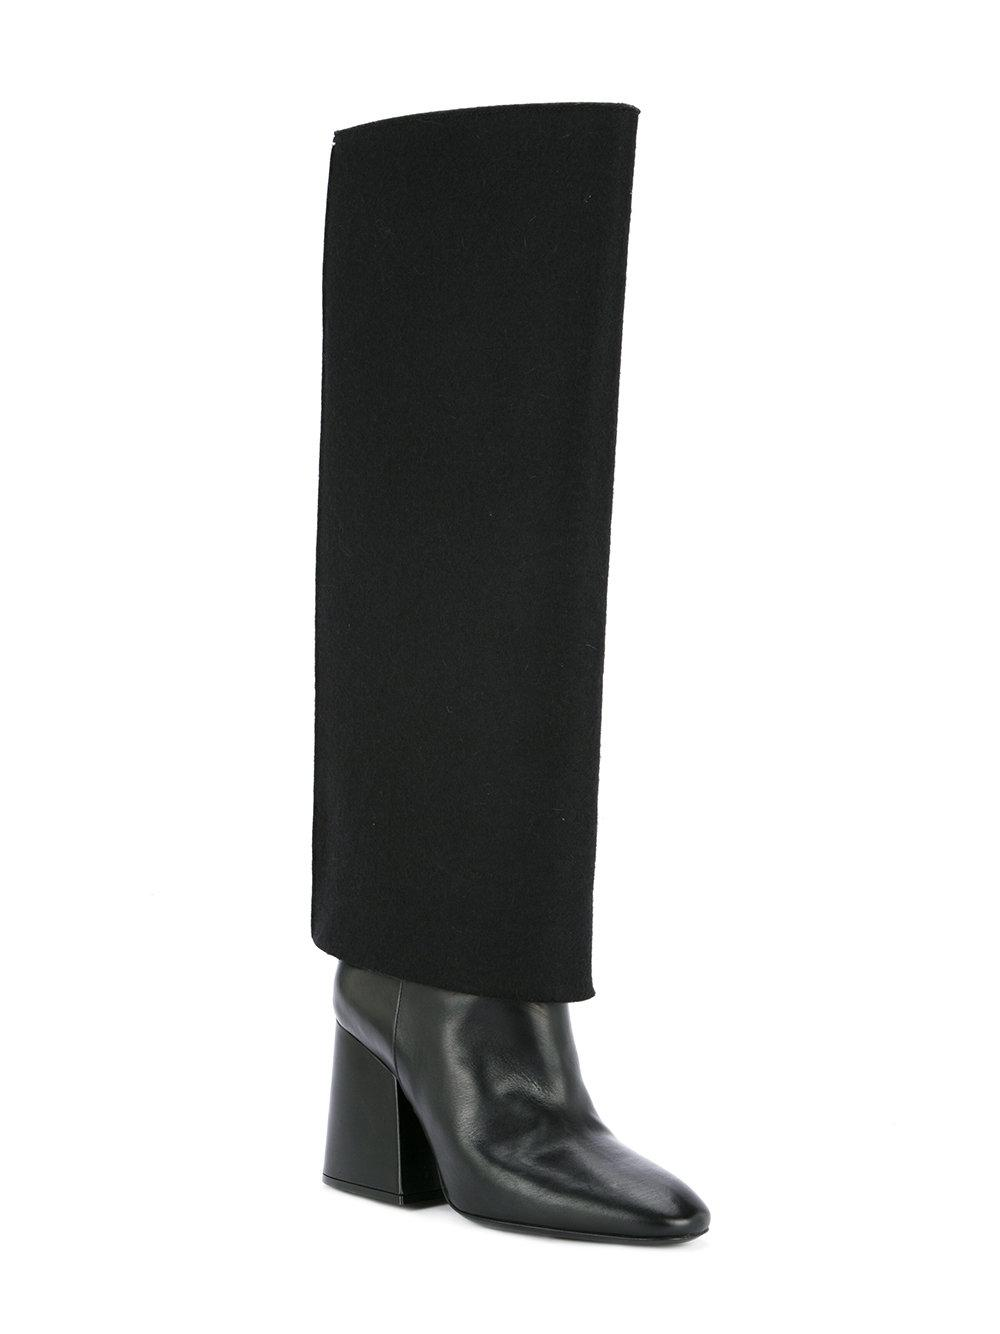 Trompe Loeil knee high boots - Black Maison Martin Margiela Clearance Shop For Cheap Sale Limited Edition Discount Affordable 100% Authentic Sale Online Outlet 2018 Newest jOkPusH